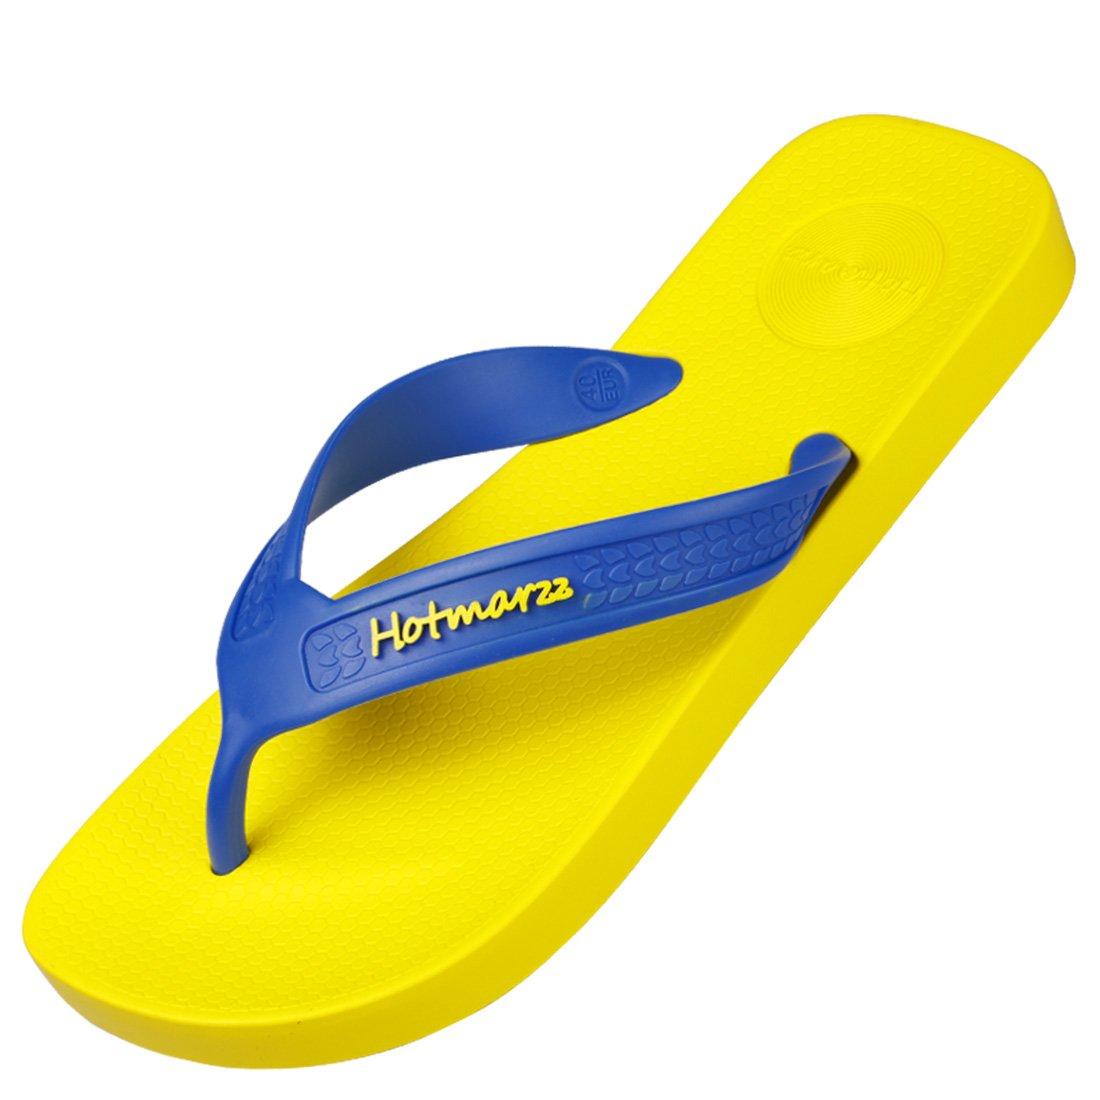 4d64a95b2837 Hotmarzz Men s Premier Flip Flops Wide Strap Beach Slippers Summer Sandals  White  Amazon.ca  Shoes   Handbags